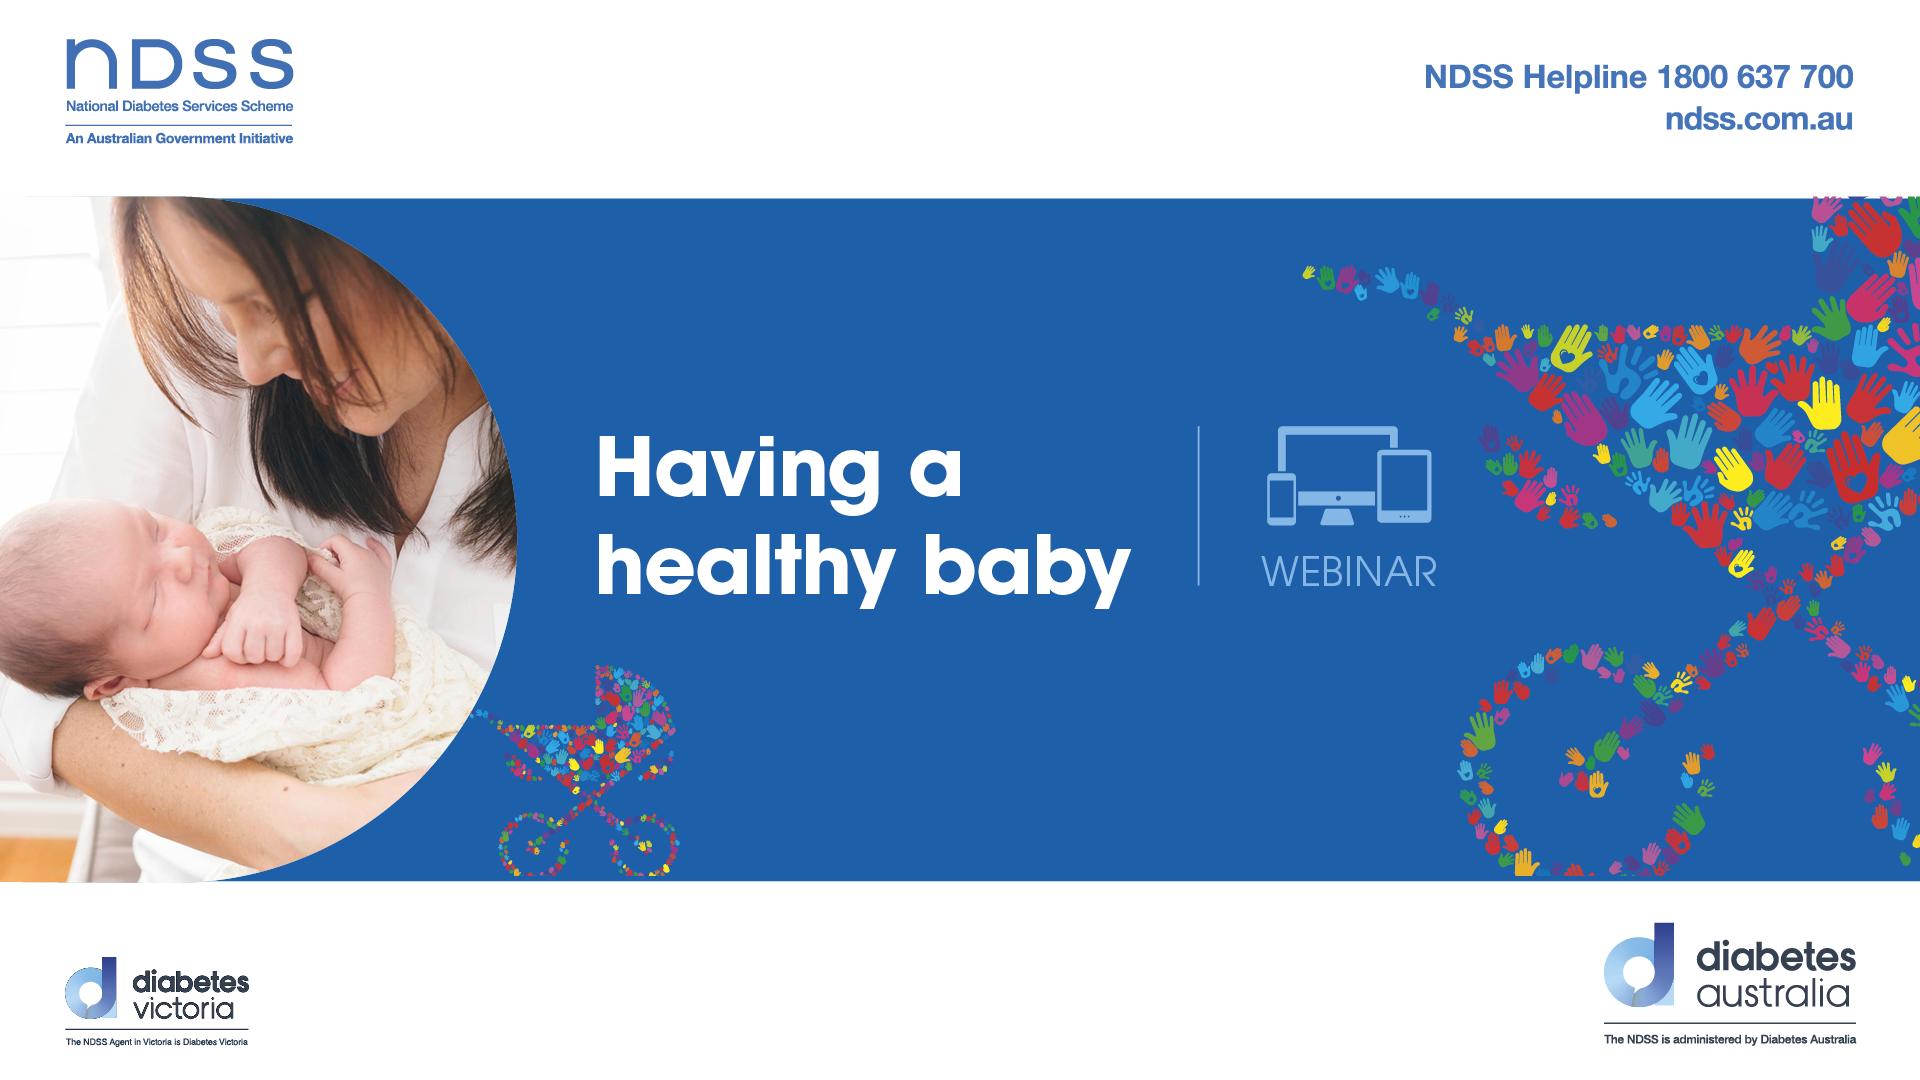 TYPE 1 DIABETES: Having a healthy baby webinar